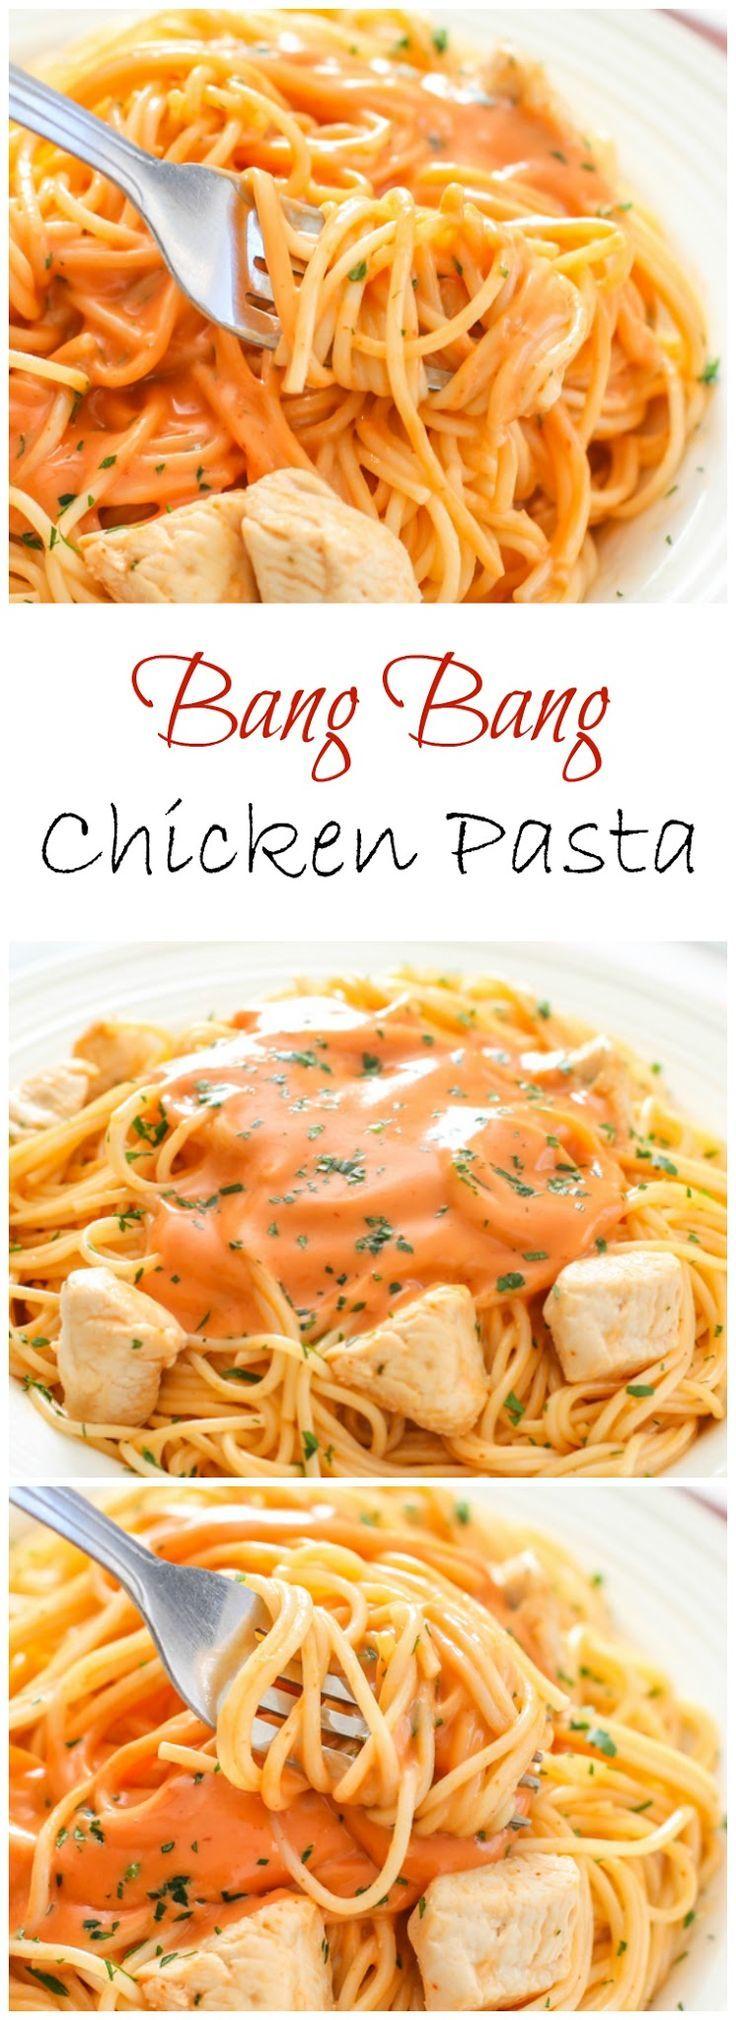 nobis outerwear sale Bang Bang Chicken Pasta